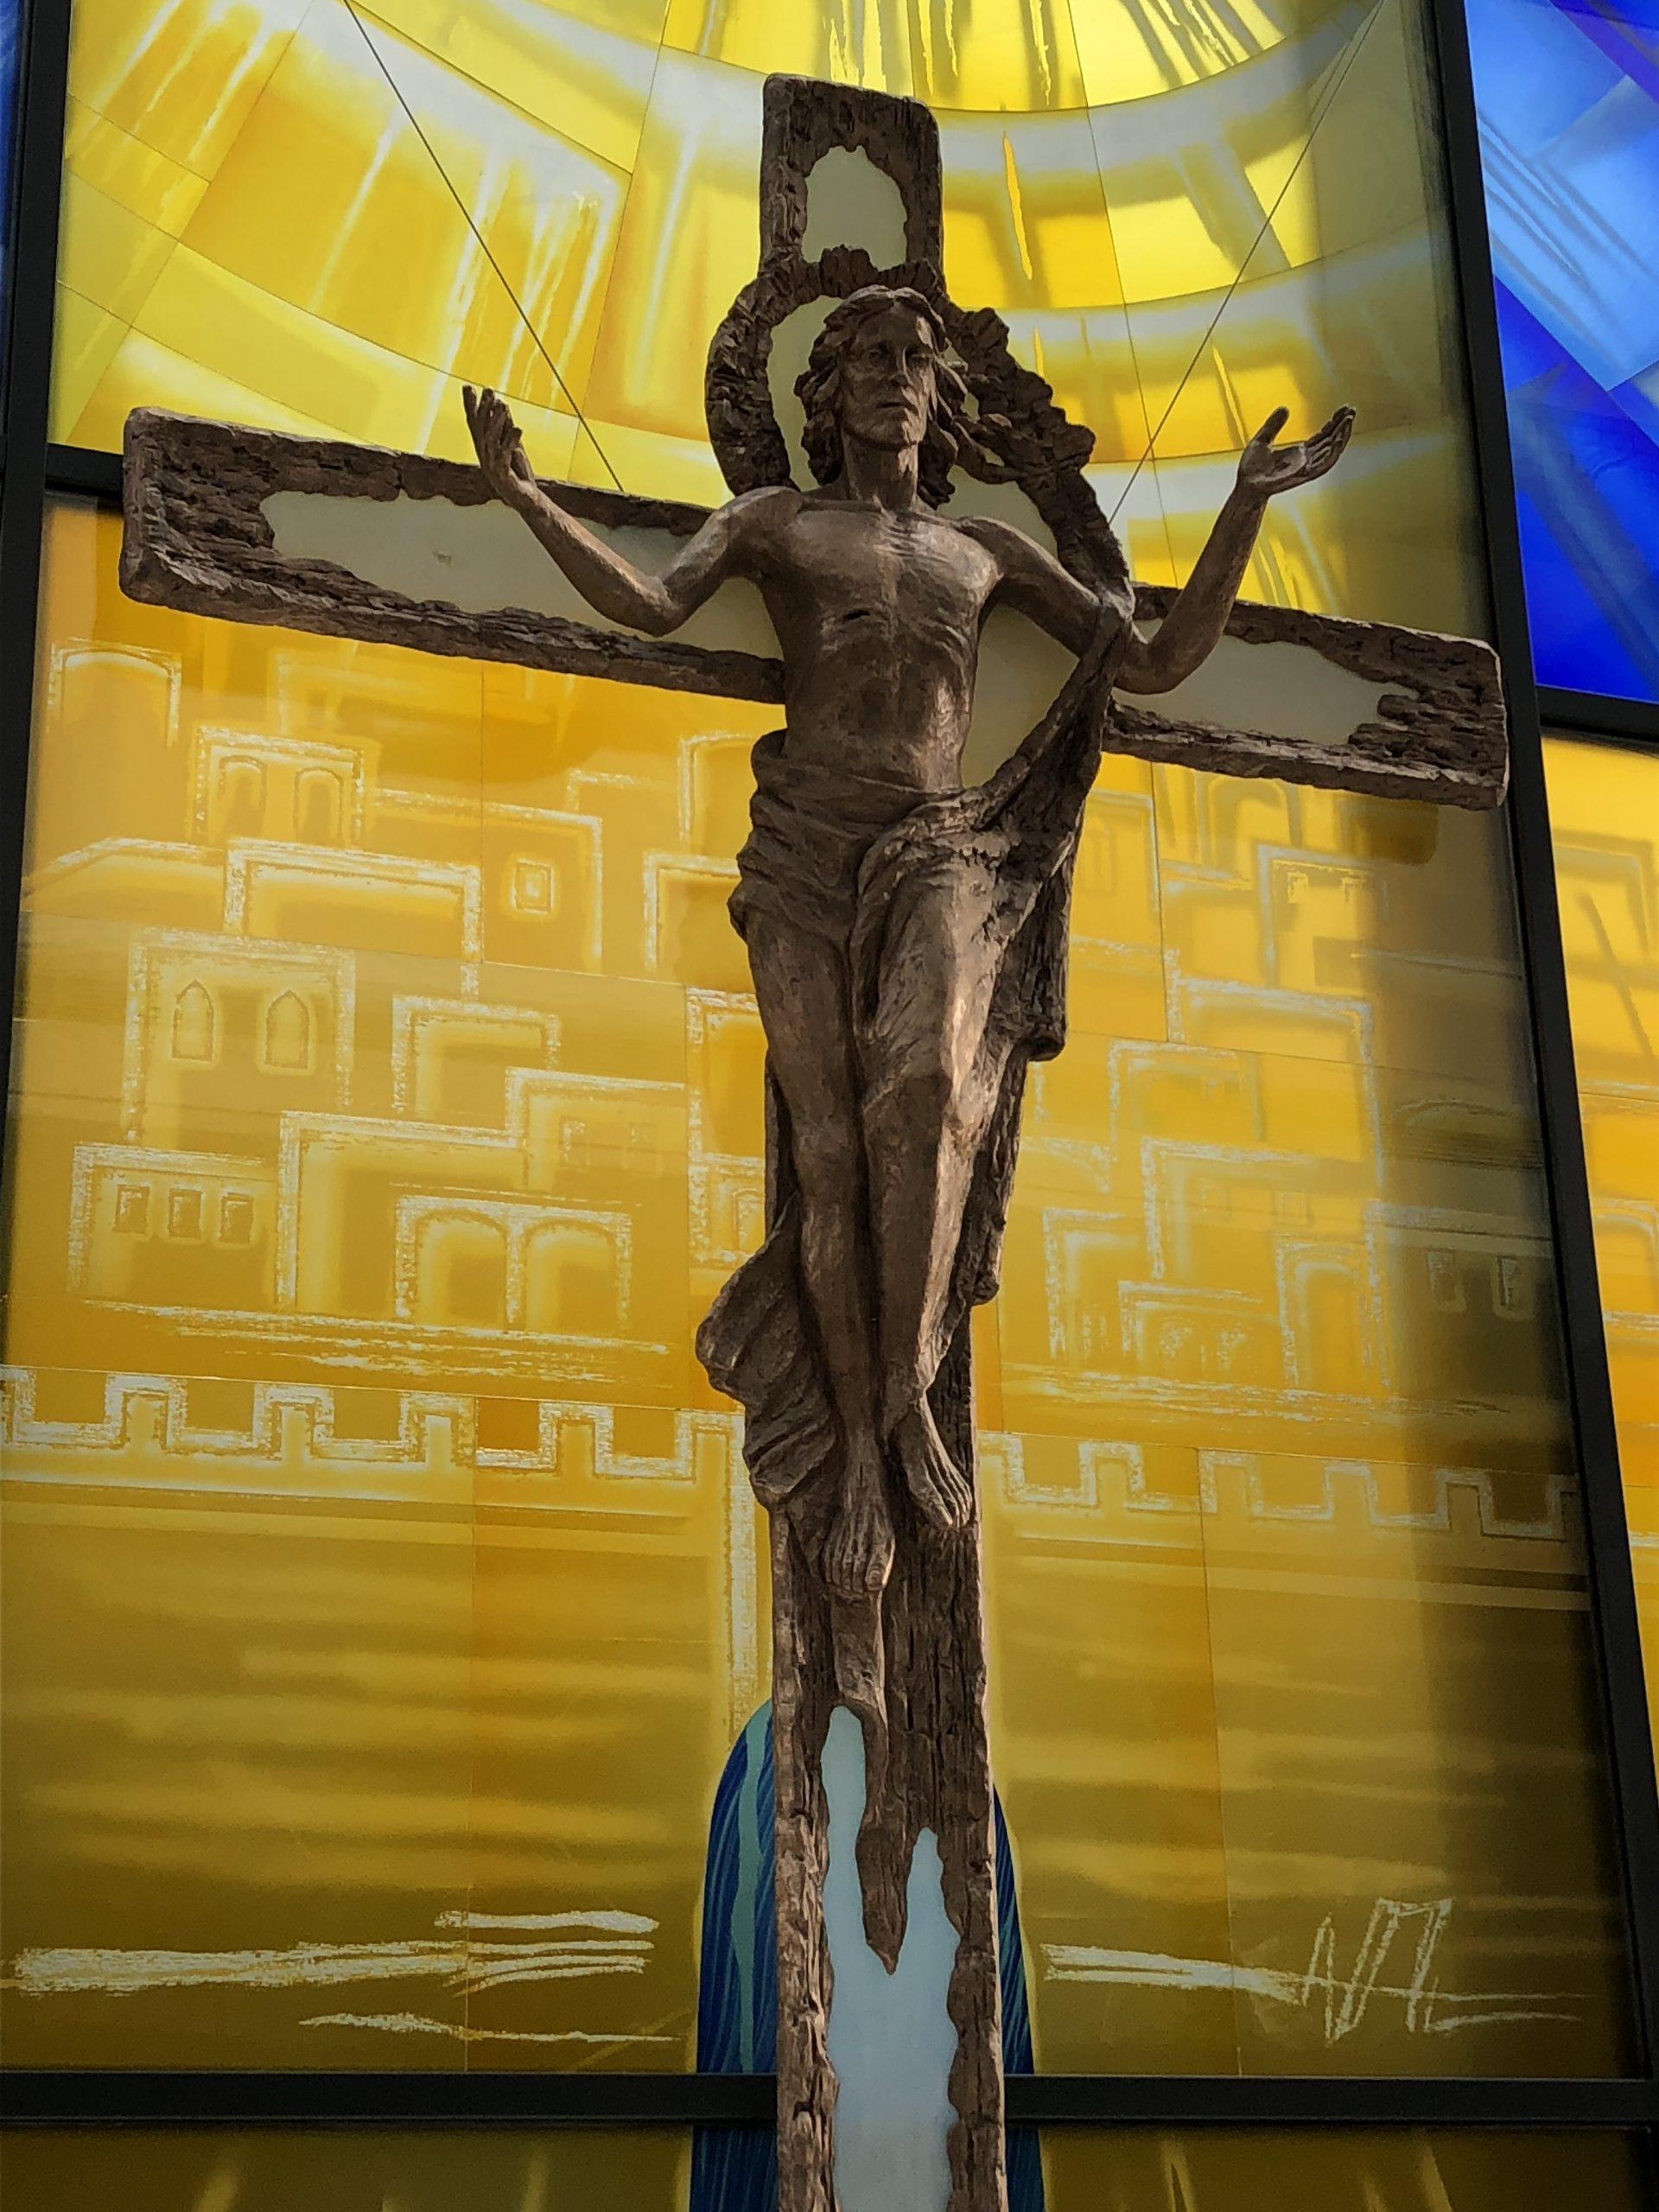 CARITAS CATHOLIC UNIVERSITY